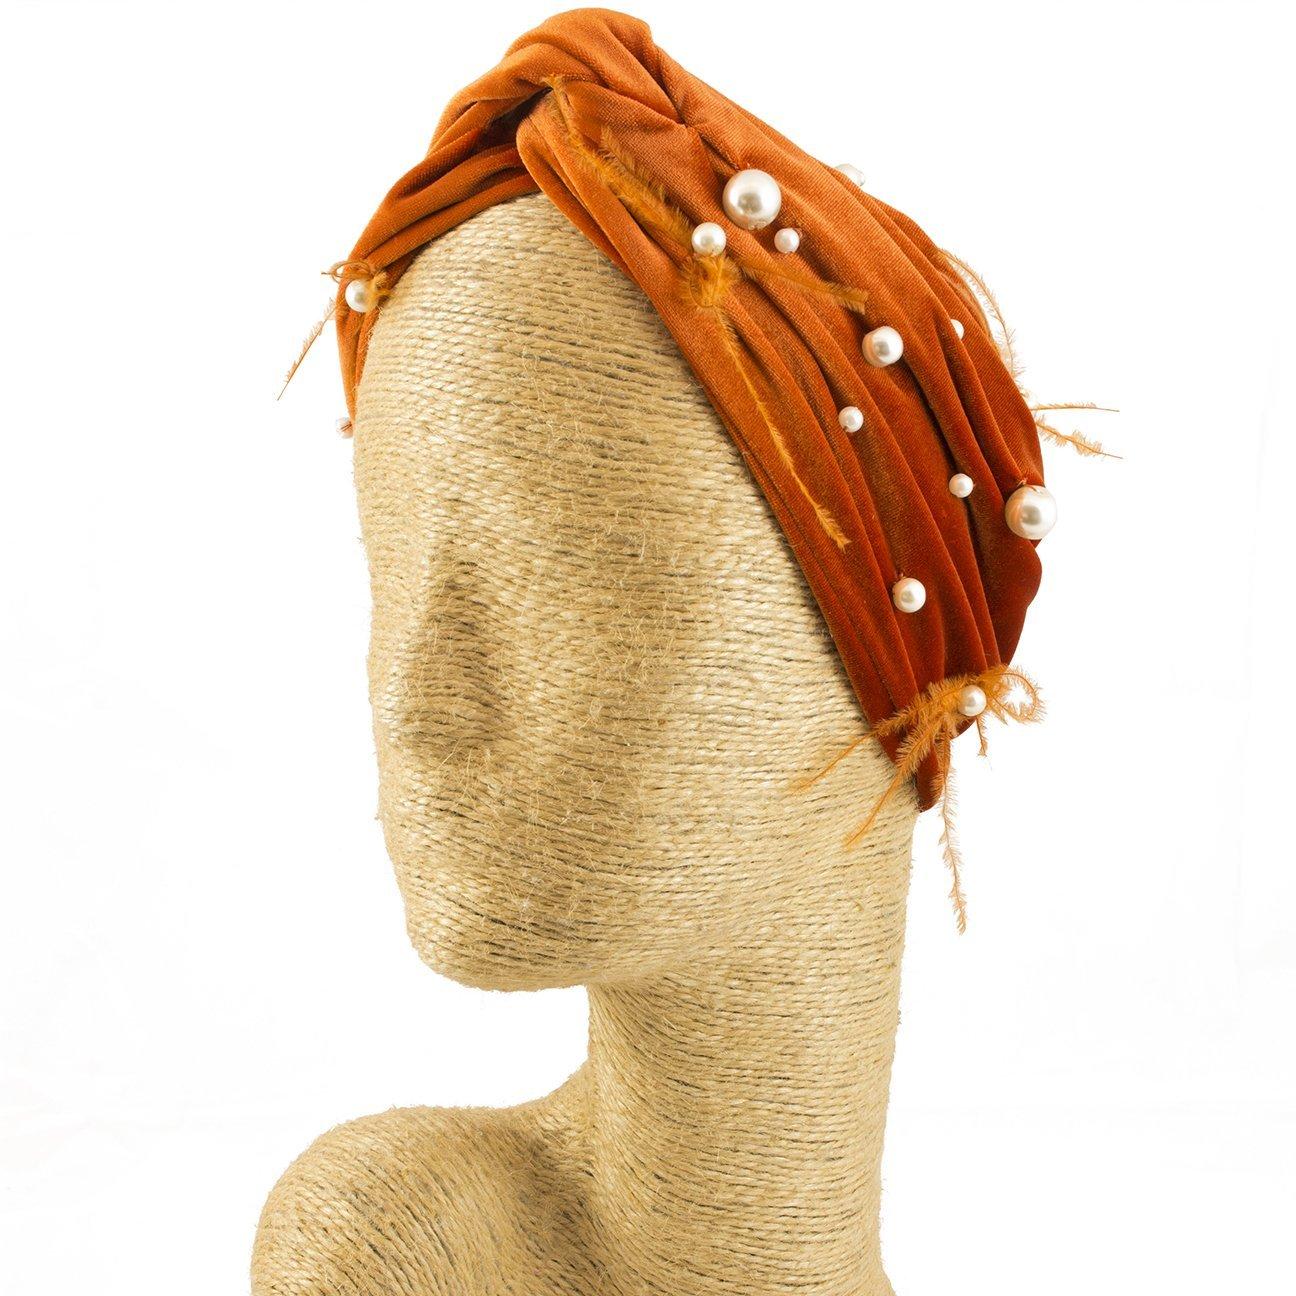 Fascinator, Velvet Headbands, Millinery, Worldwide Free Shipment, Delivery in 2 Days, Customized Tailoring, Designer Fashion, Pearl, Head wrap, Boho Accessories, Orange, Beaded Headbands, Jewelled